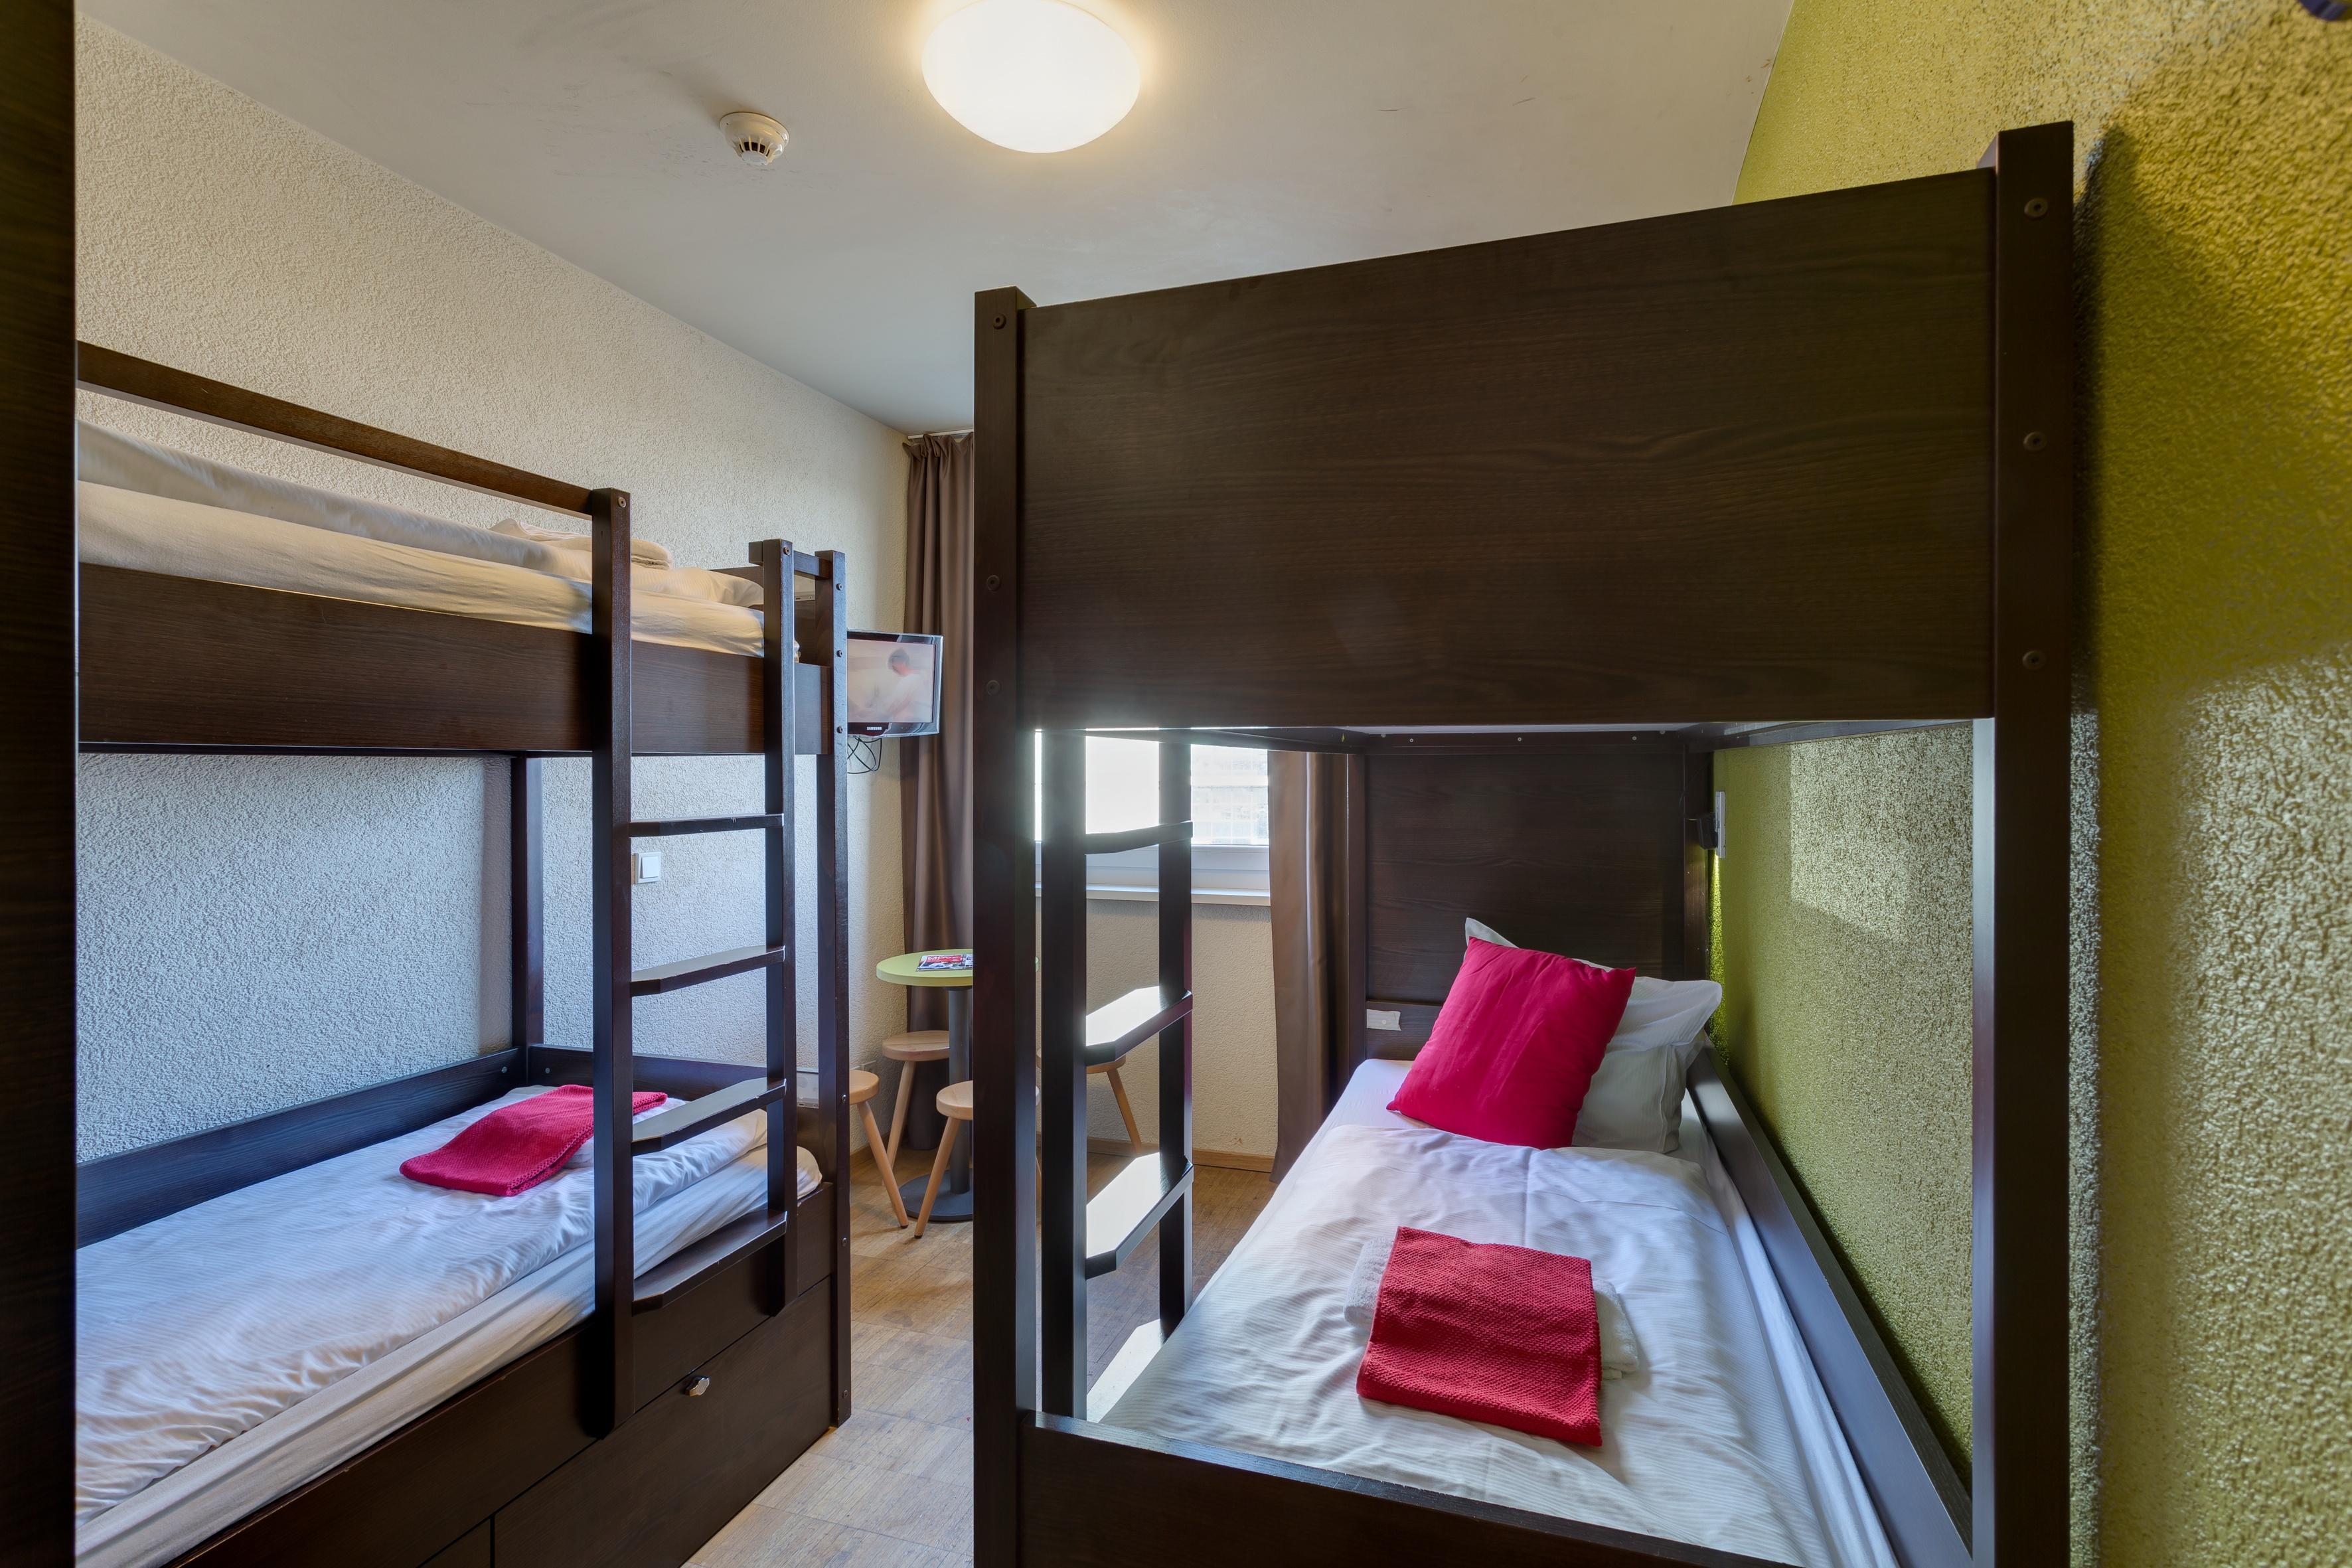 MEININGER Hotel Berlin Central Station - Multi-bed